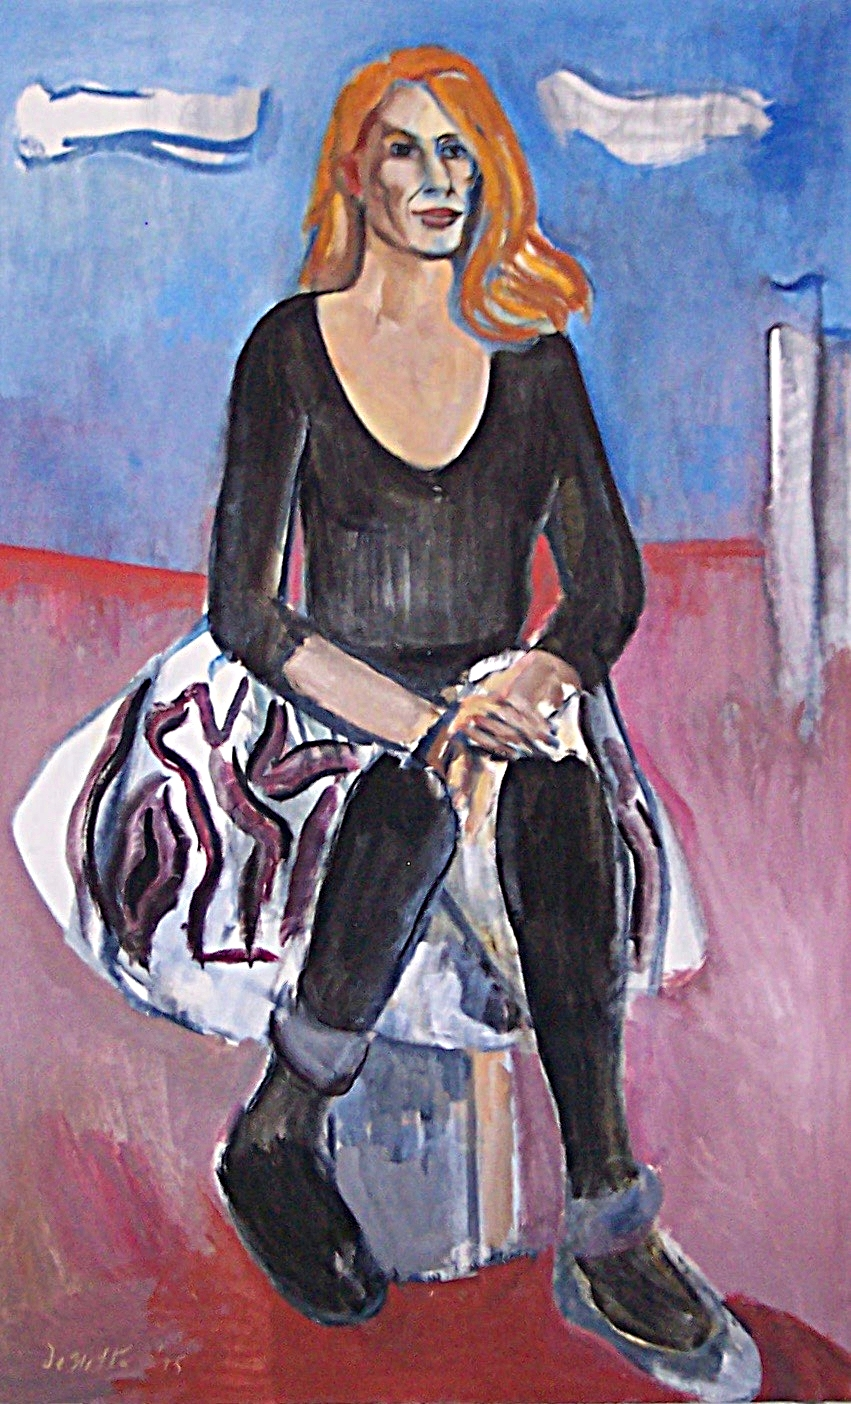 Portrait of the Artist, Corliss Block